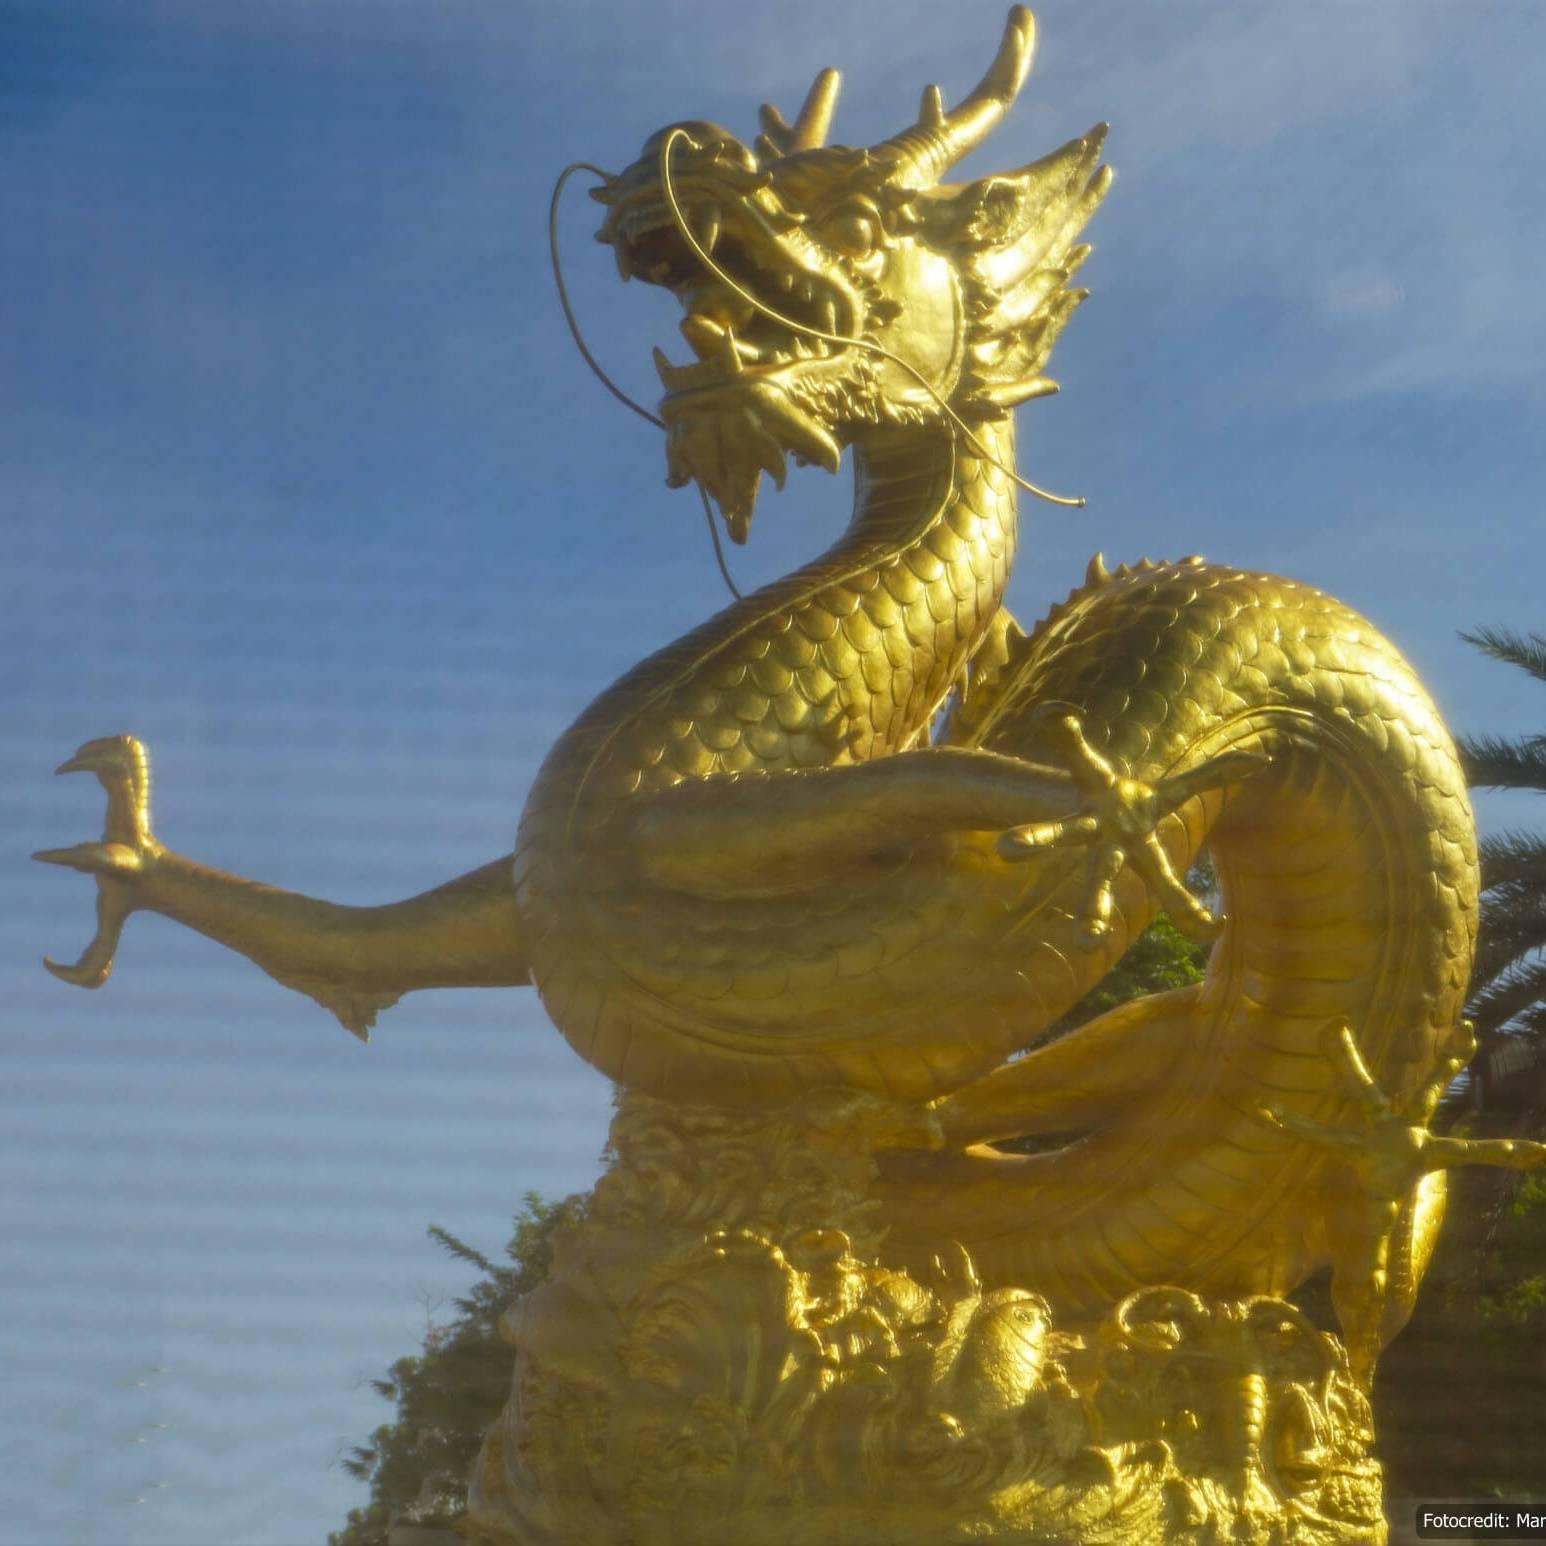 Hai Leng Ong (goldener Drache) in Phuket Town (Reisetagebuch «Thailand als Alleinreisende ohne Roller entdecken»)